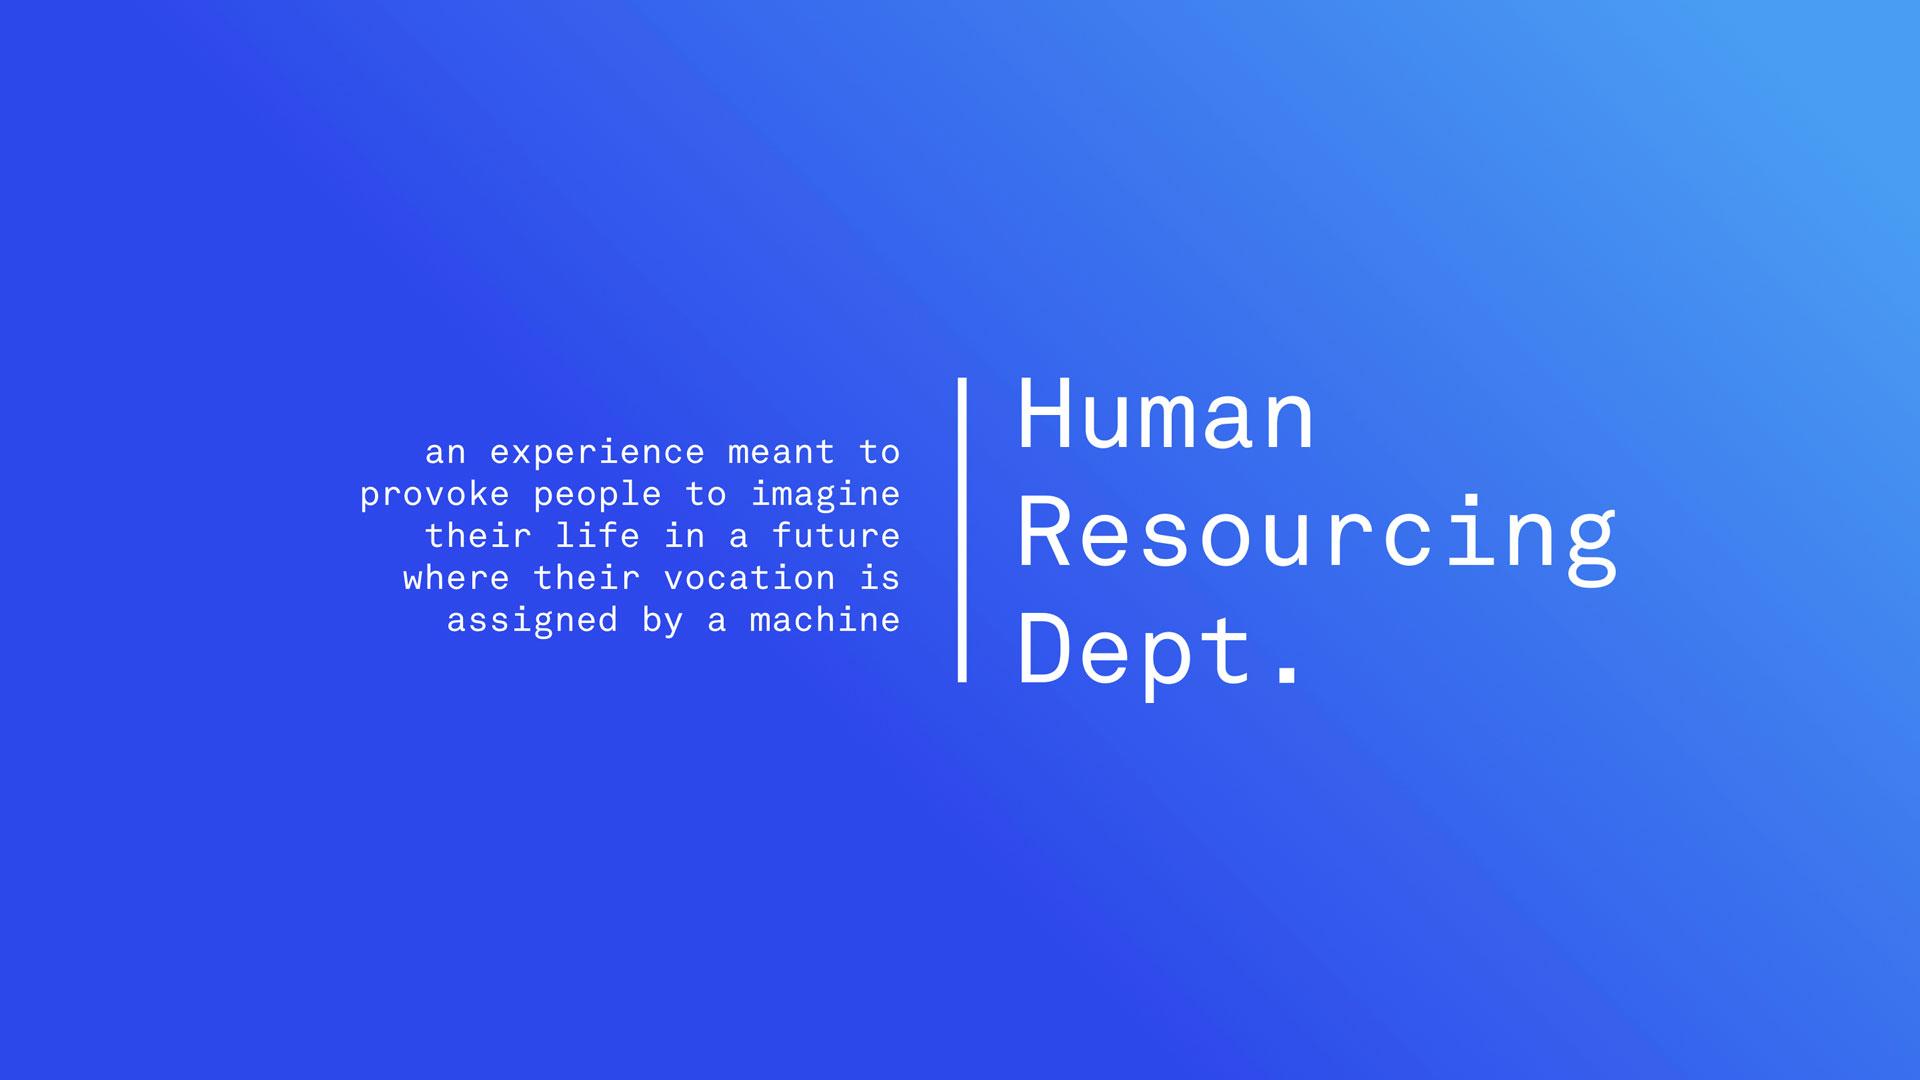 Crum_Human-Resourcing-Title.jpg